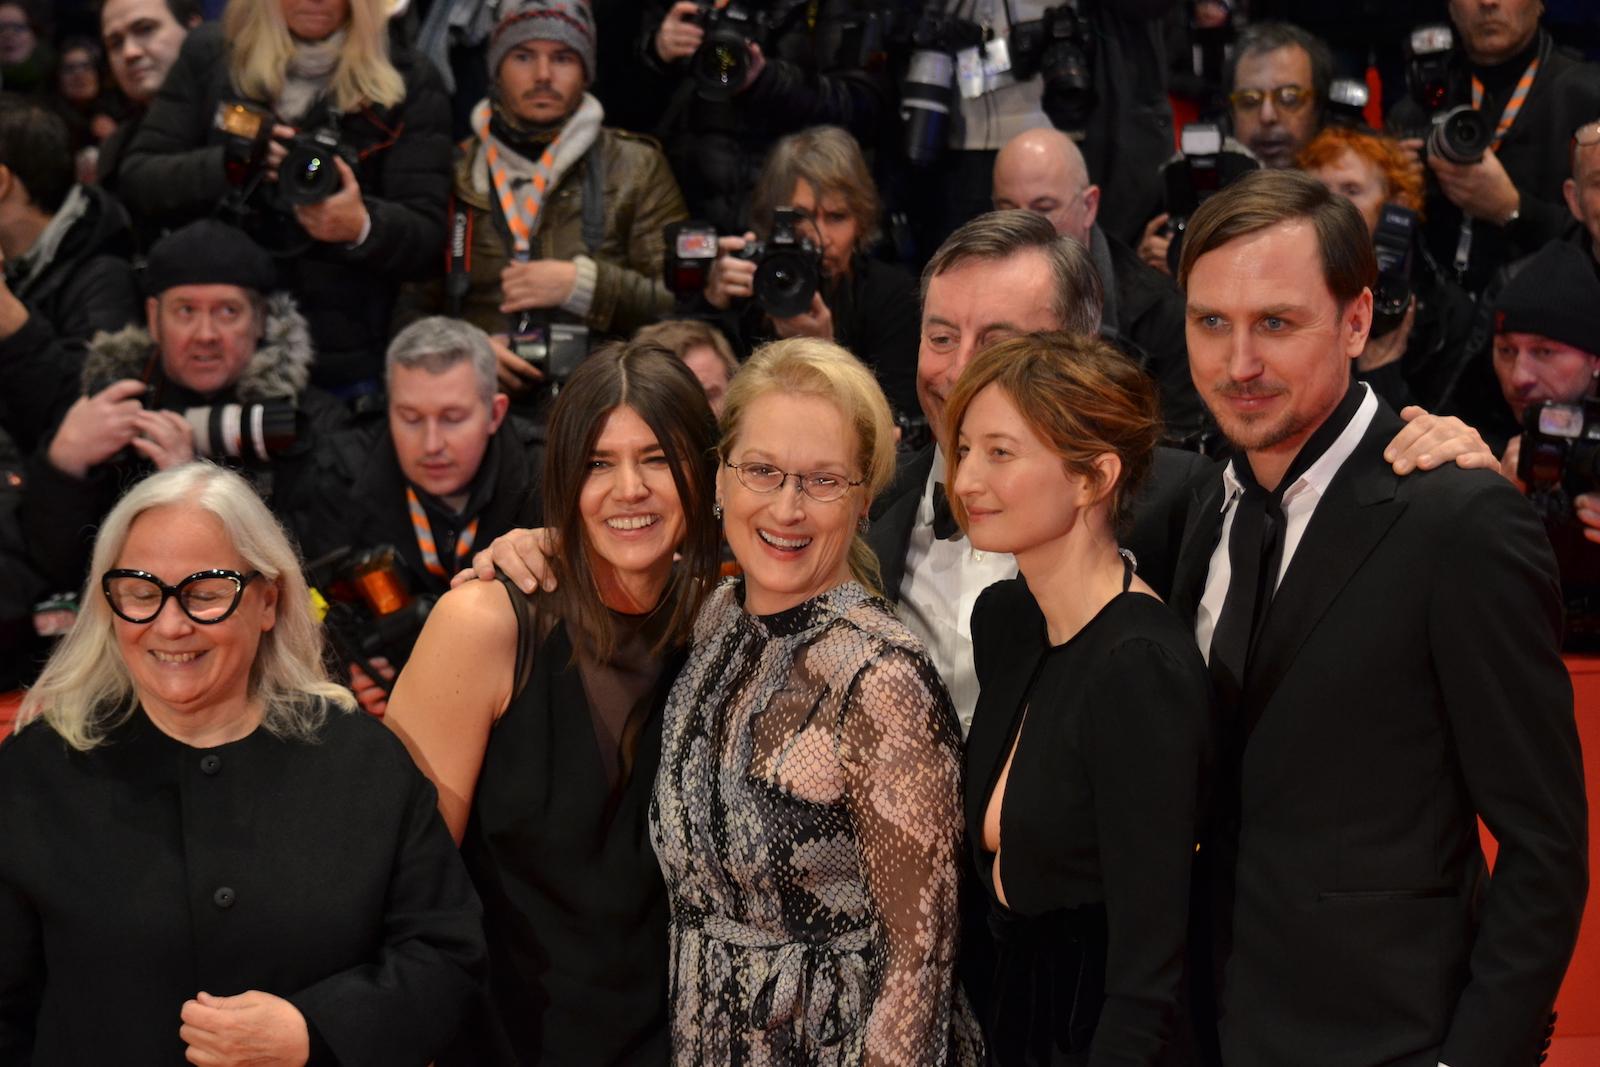 Berlino 2016:Meryl Streep, Alba Rohrwacher, Lars Eidinger,Nick James, Brigitte Lacombe sul red carpet